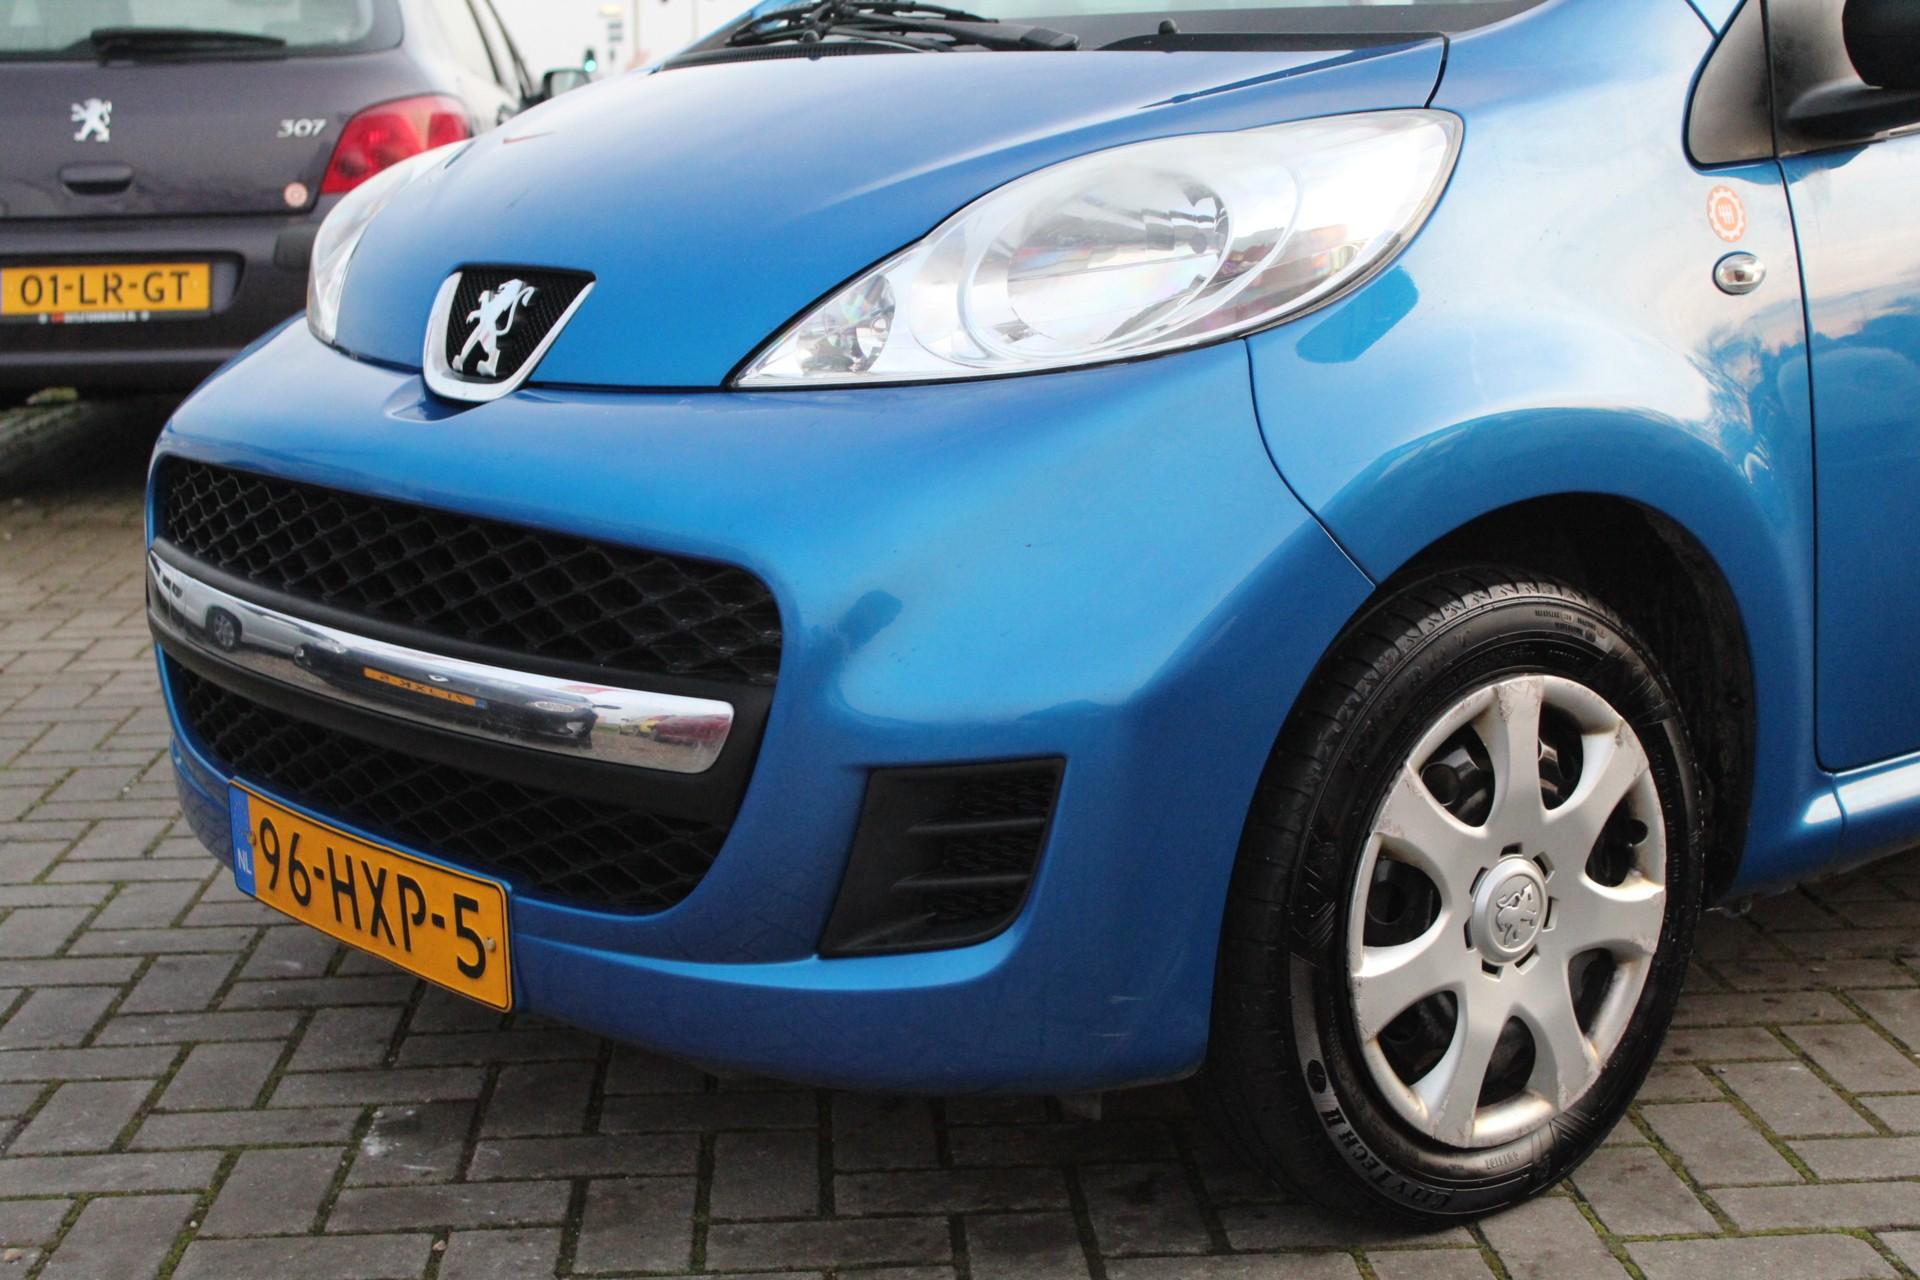 Caroutlet Groningen - Peugeot 107 1.0-12V | 2009 | NW APK | STUURBEKRACHTING